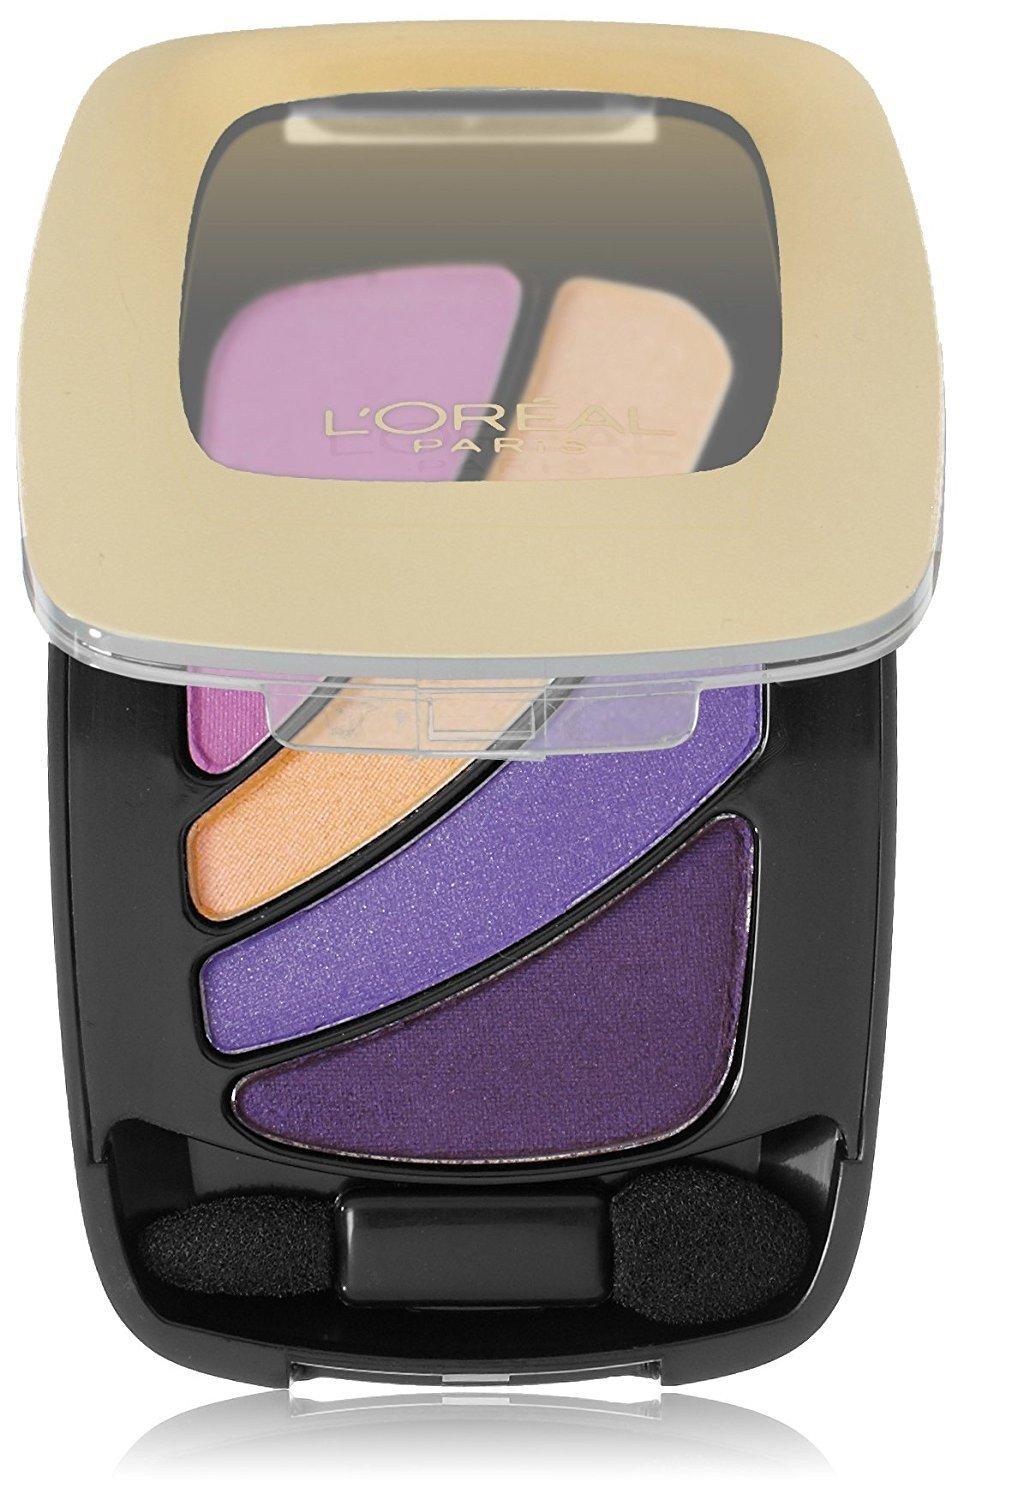 L'Oreal Paris Colour Riche Eye Shadow, Hollywood Icon, 0.17 Oz + FREE LA Cross 71817 Tweezer